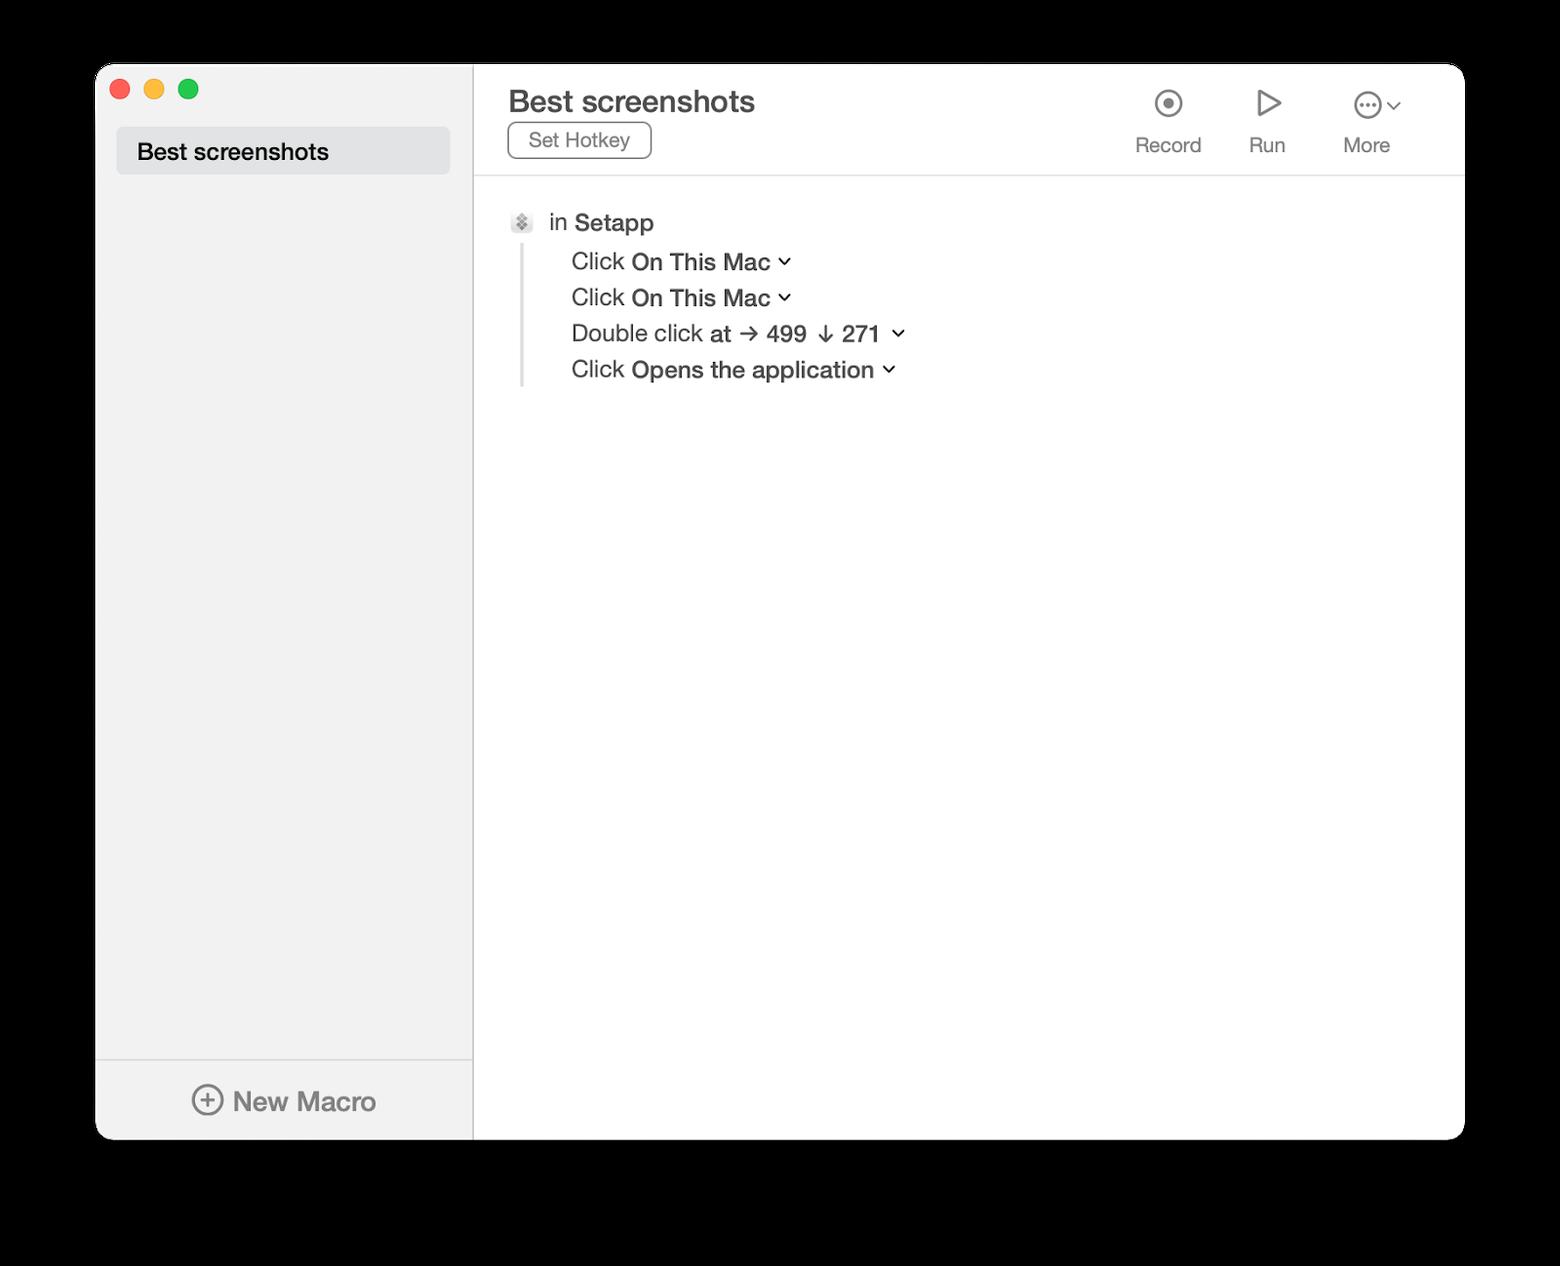 set your own shortcut key combinations